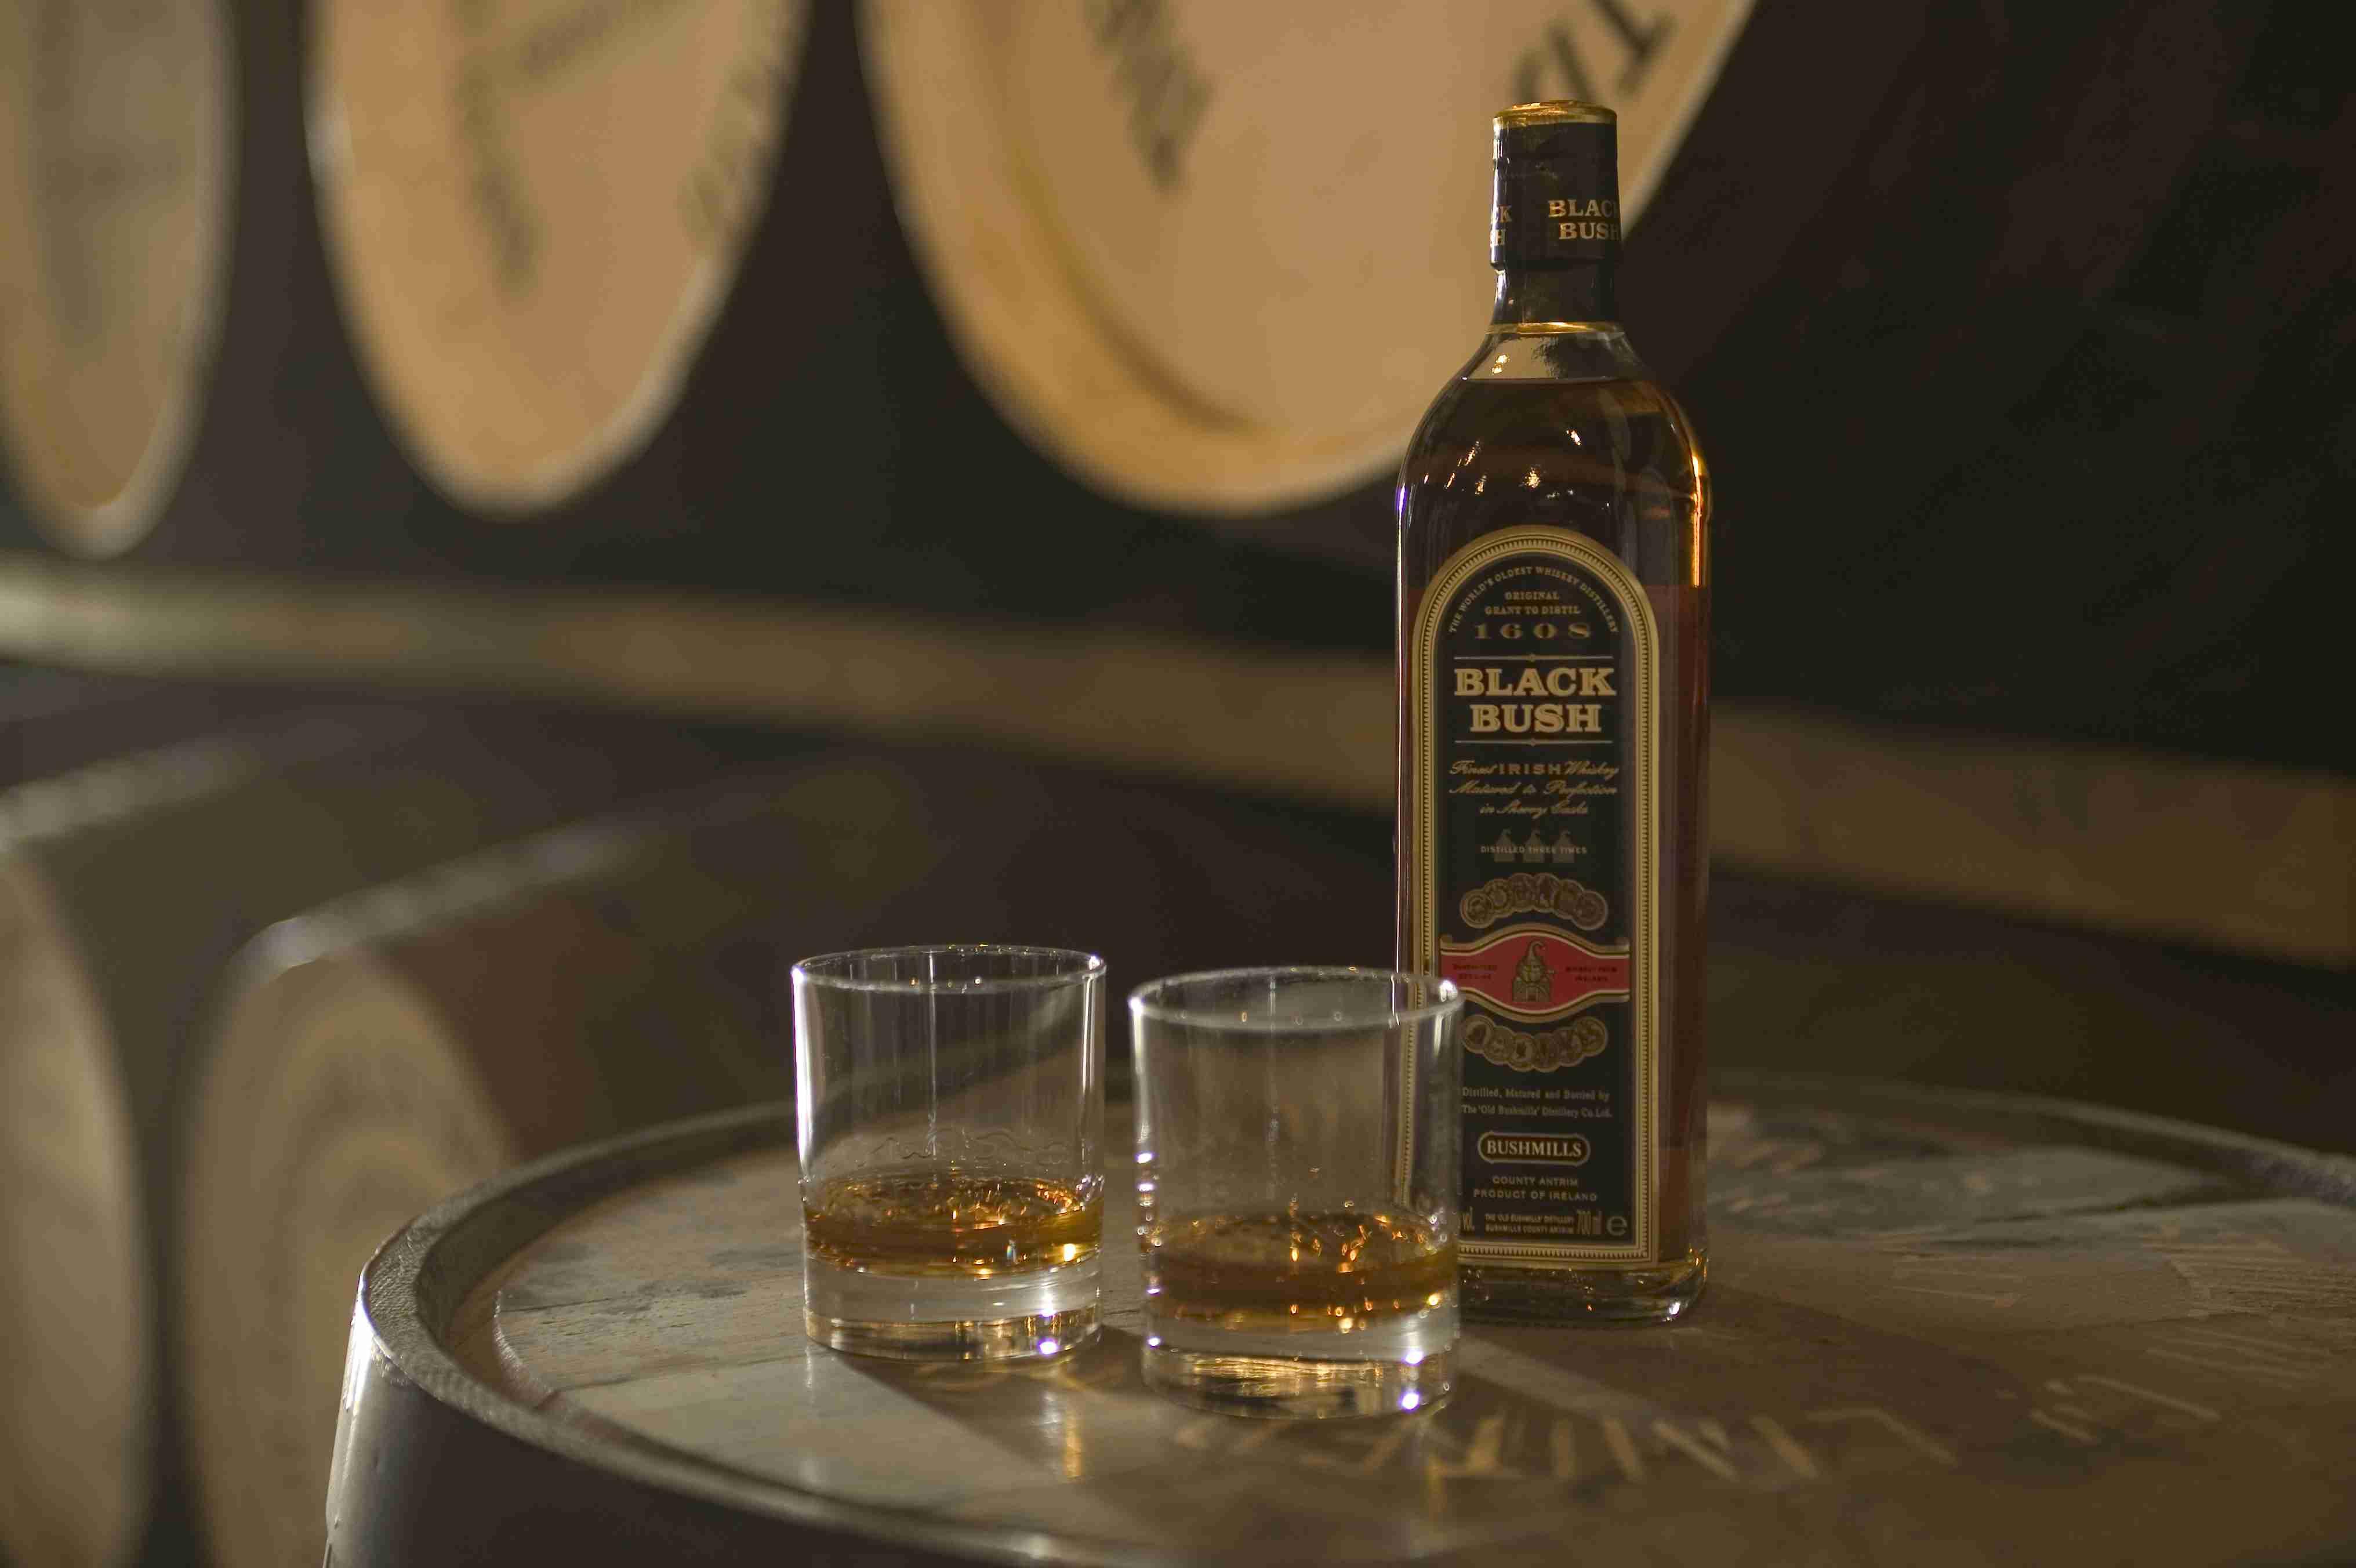 Bushmills whiskey & glasses, Bushmills, County Antrim, Northern Ireland.